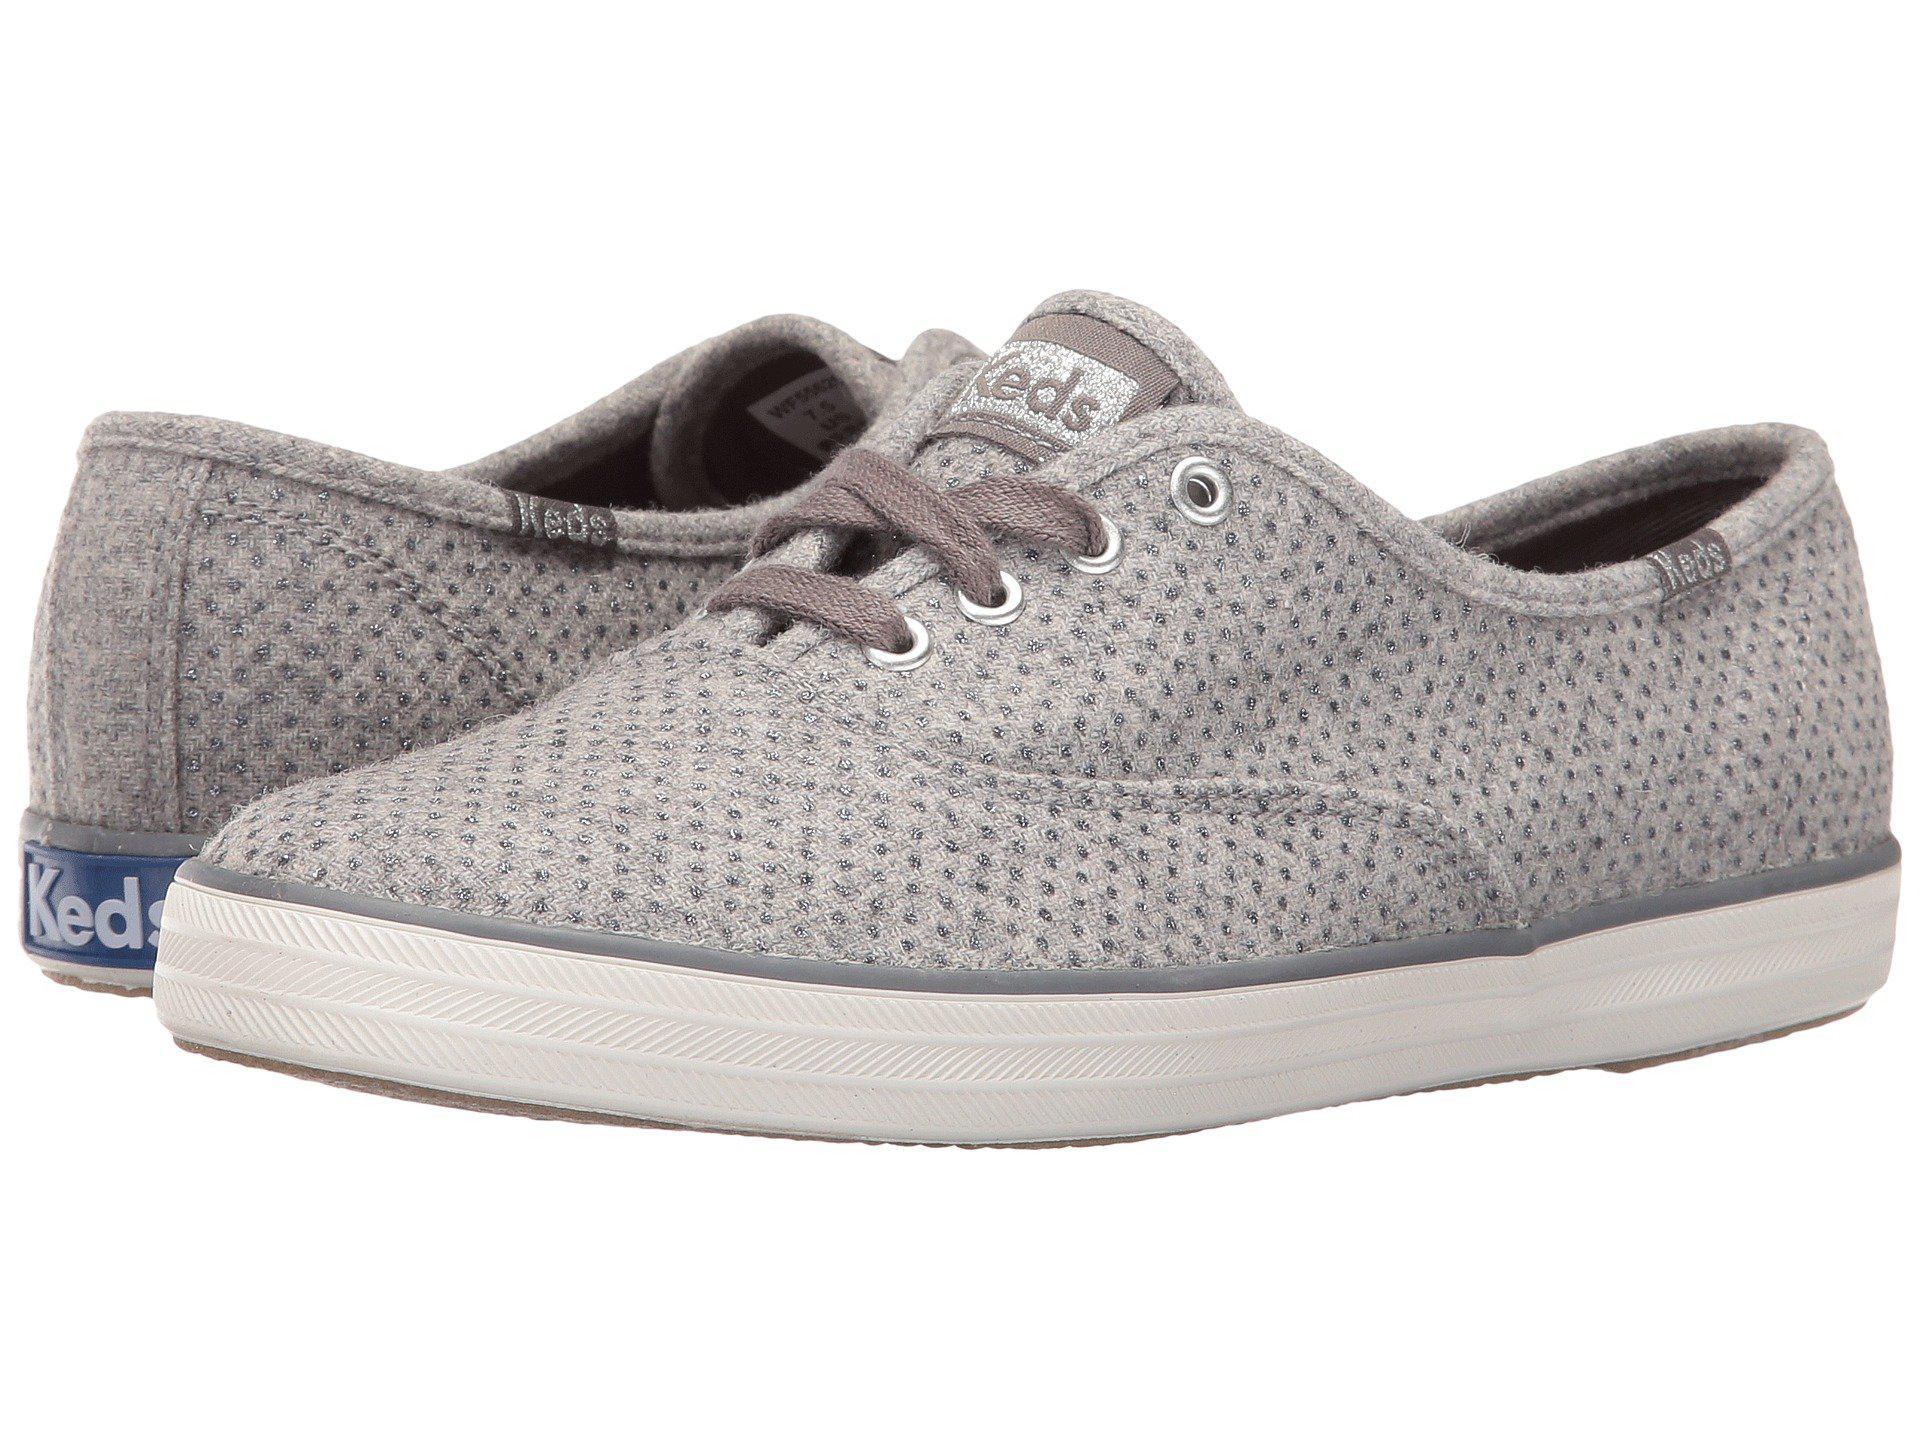 0acd548db6b88 Lyst - Keds Champion Glitter Wool Fashion Sneaker in Gray